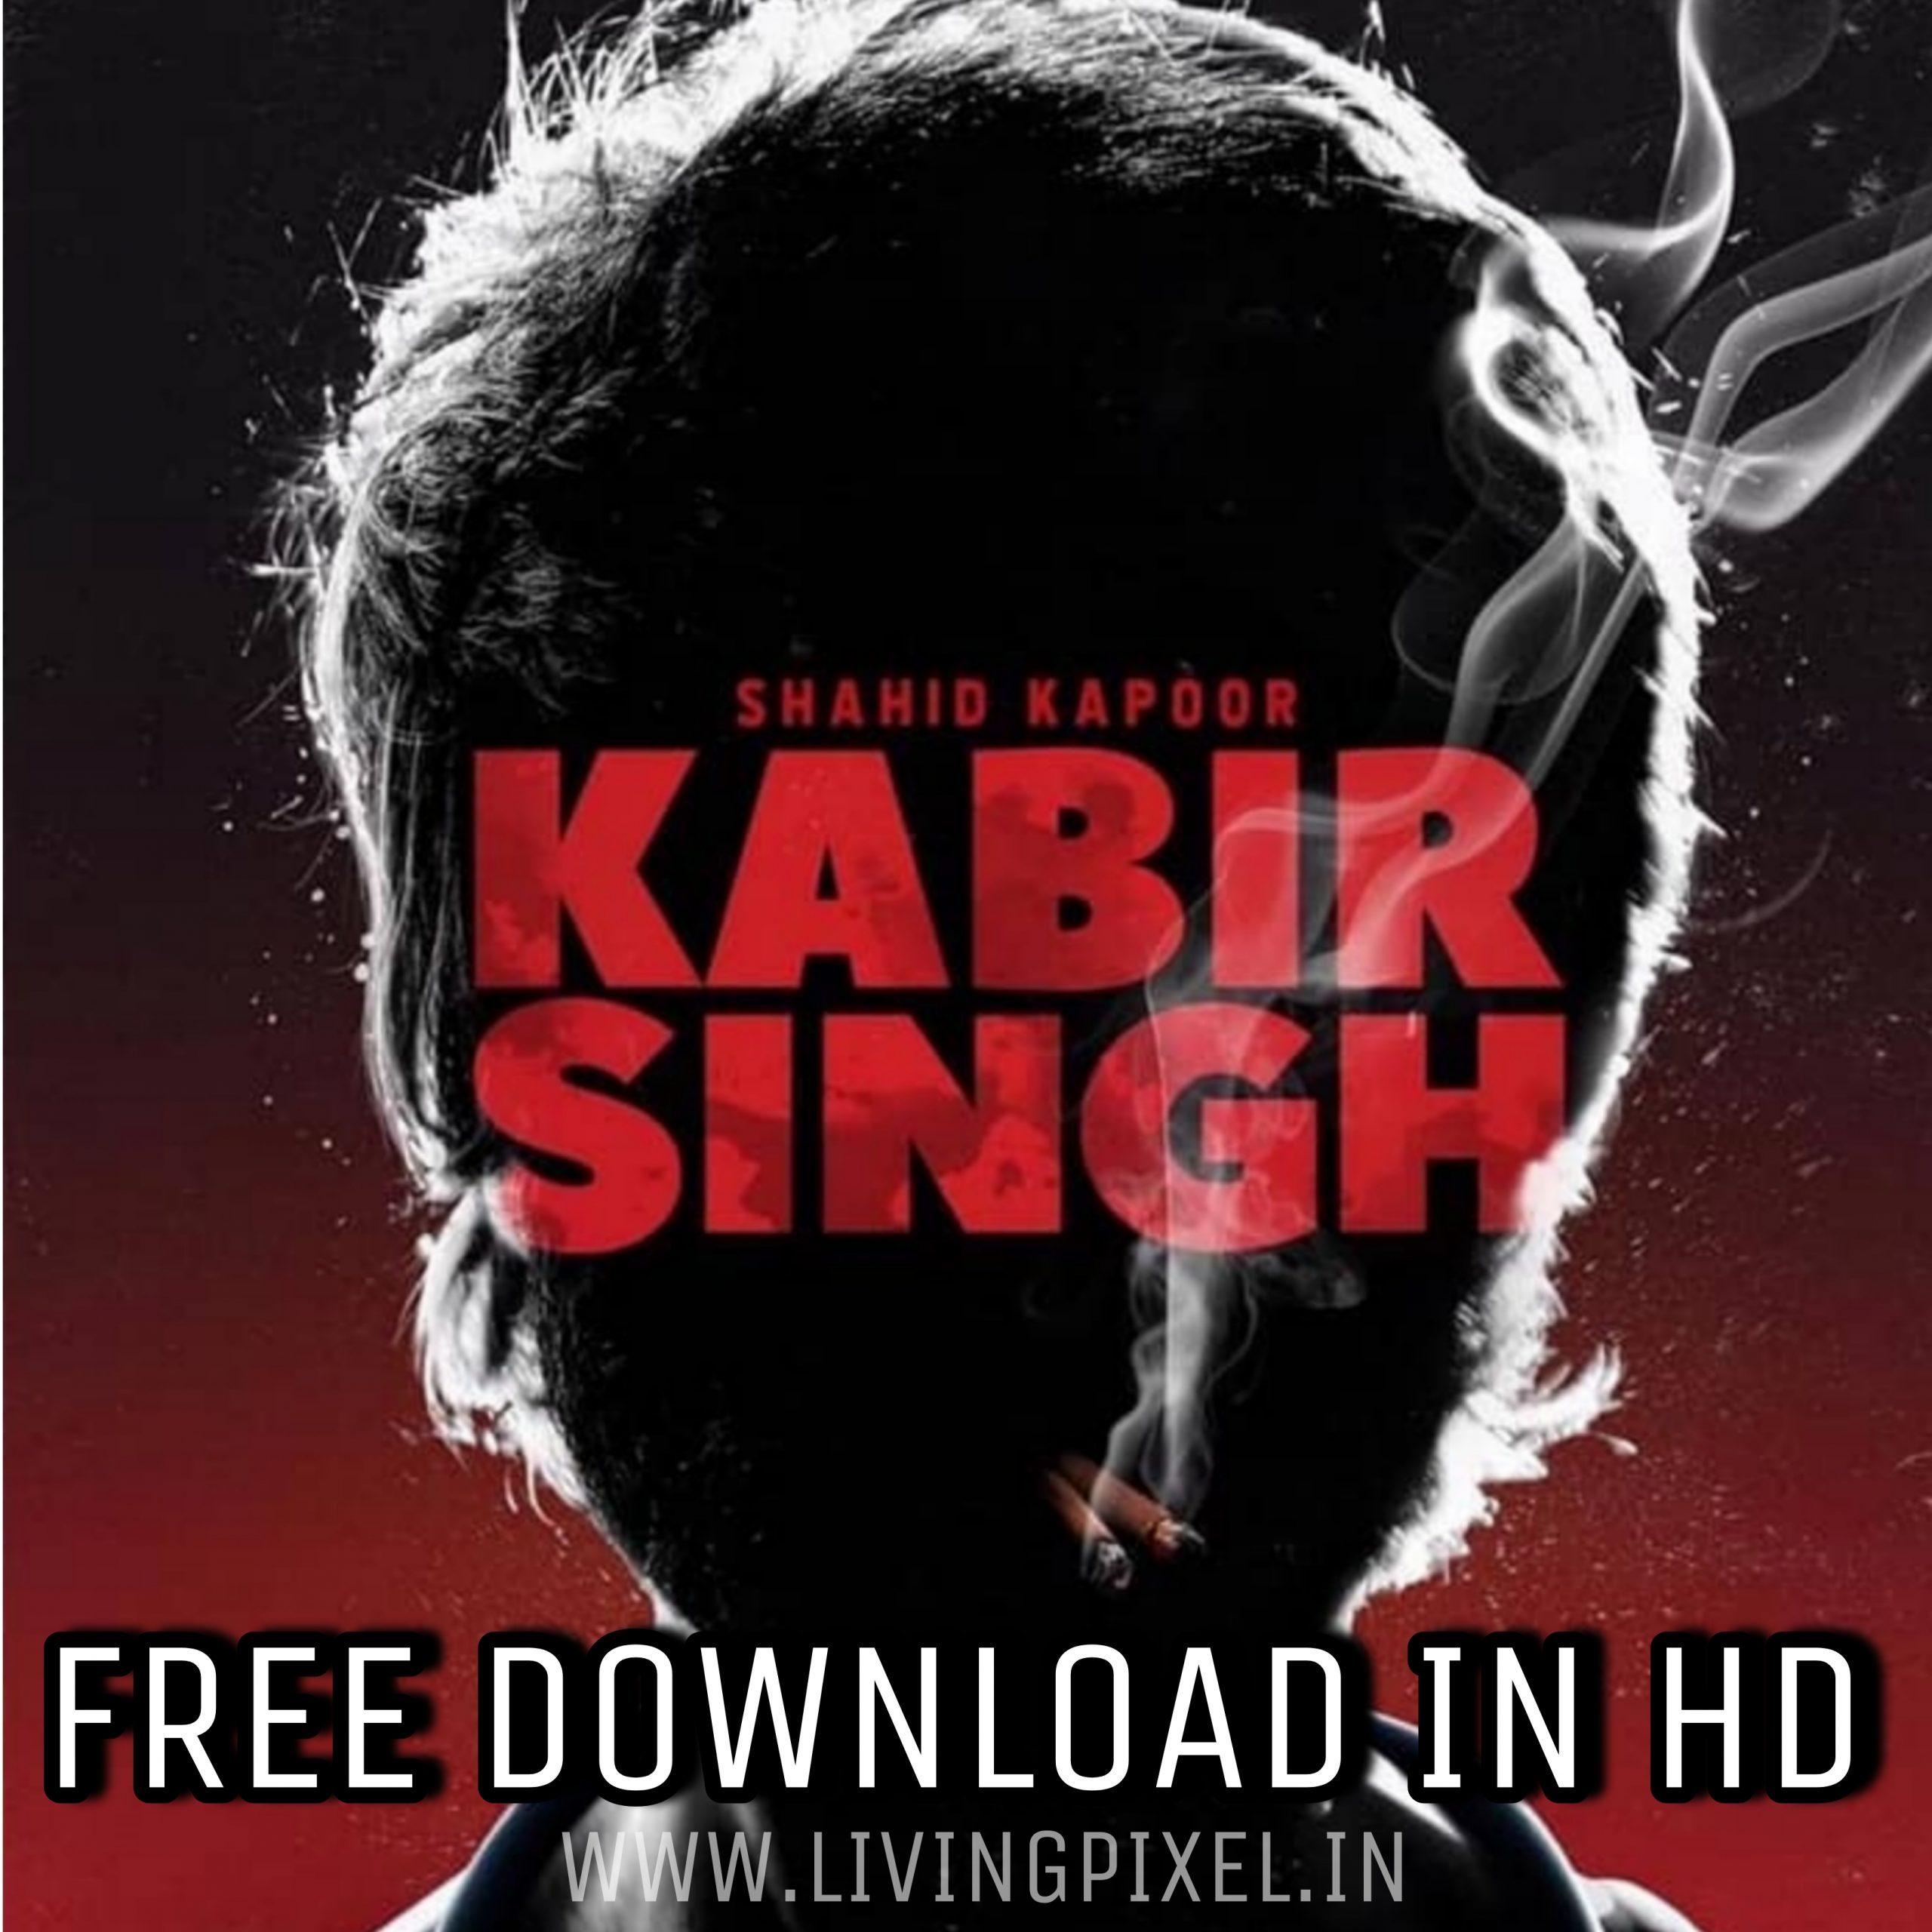 Kabir Singh movie download pagalworld 1080p in HD